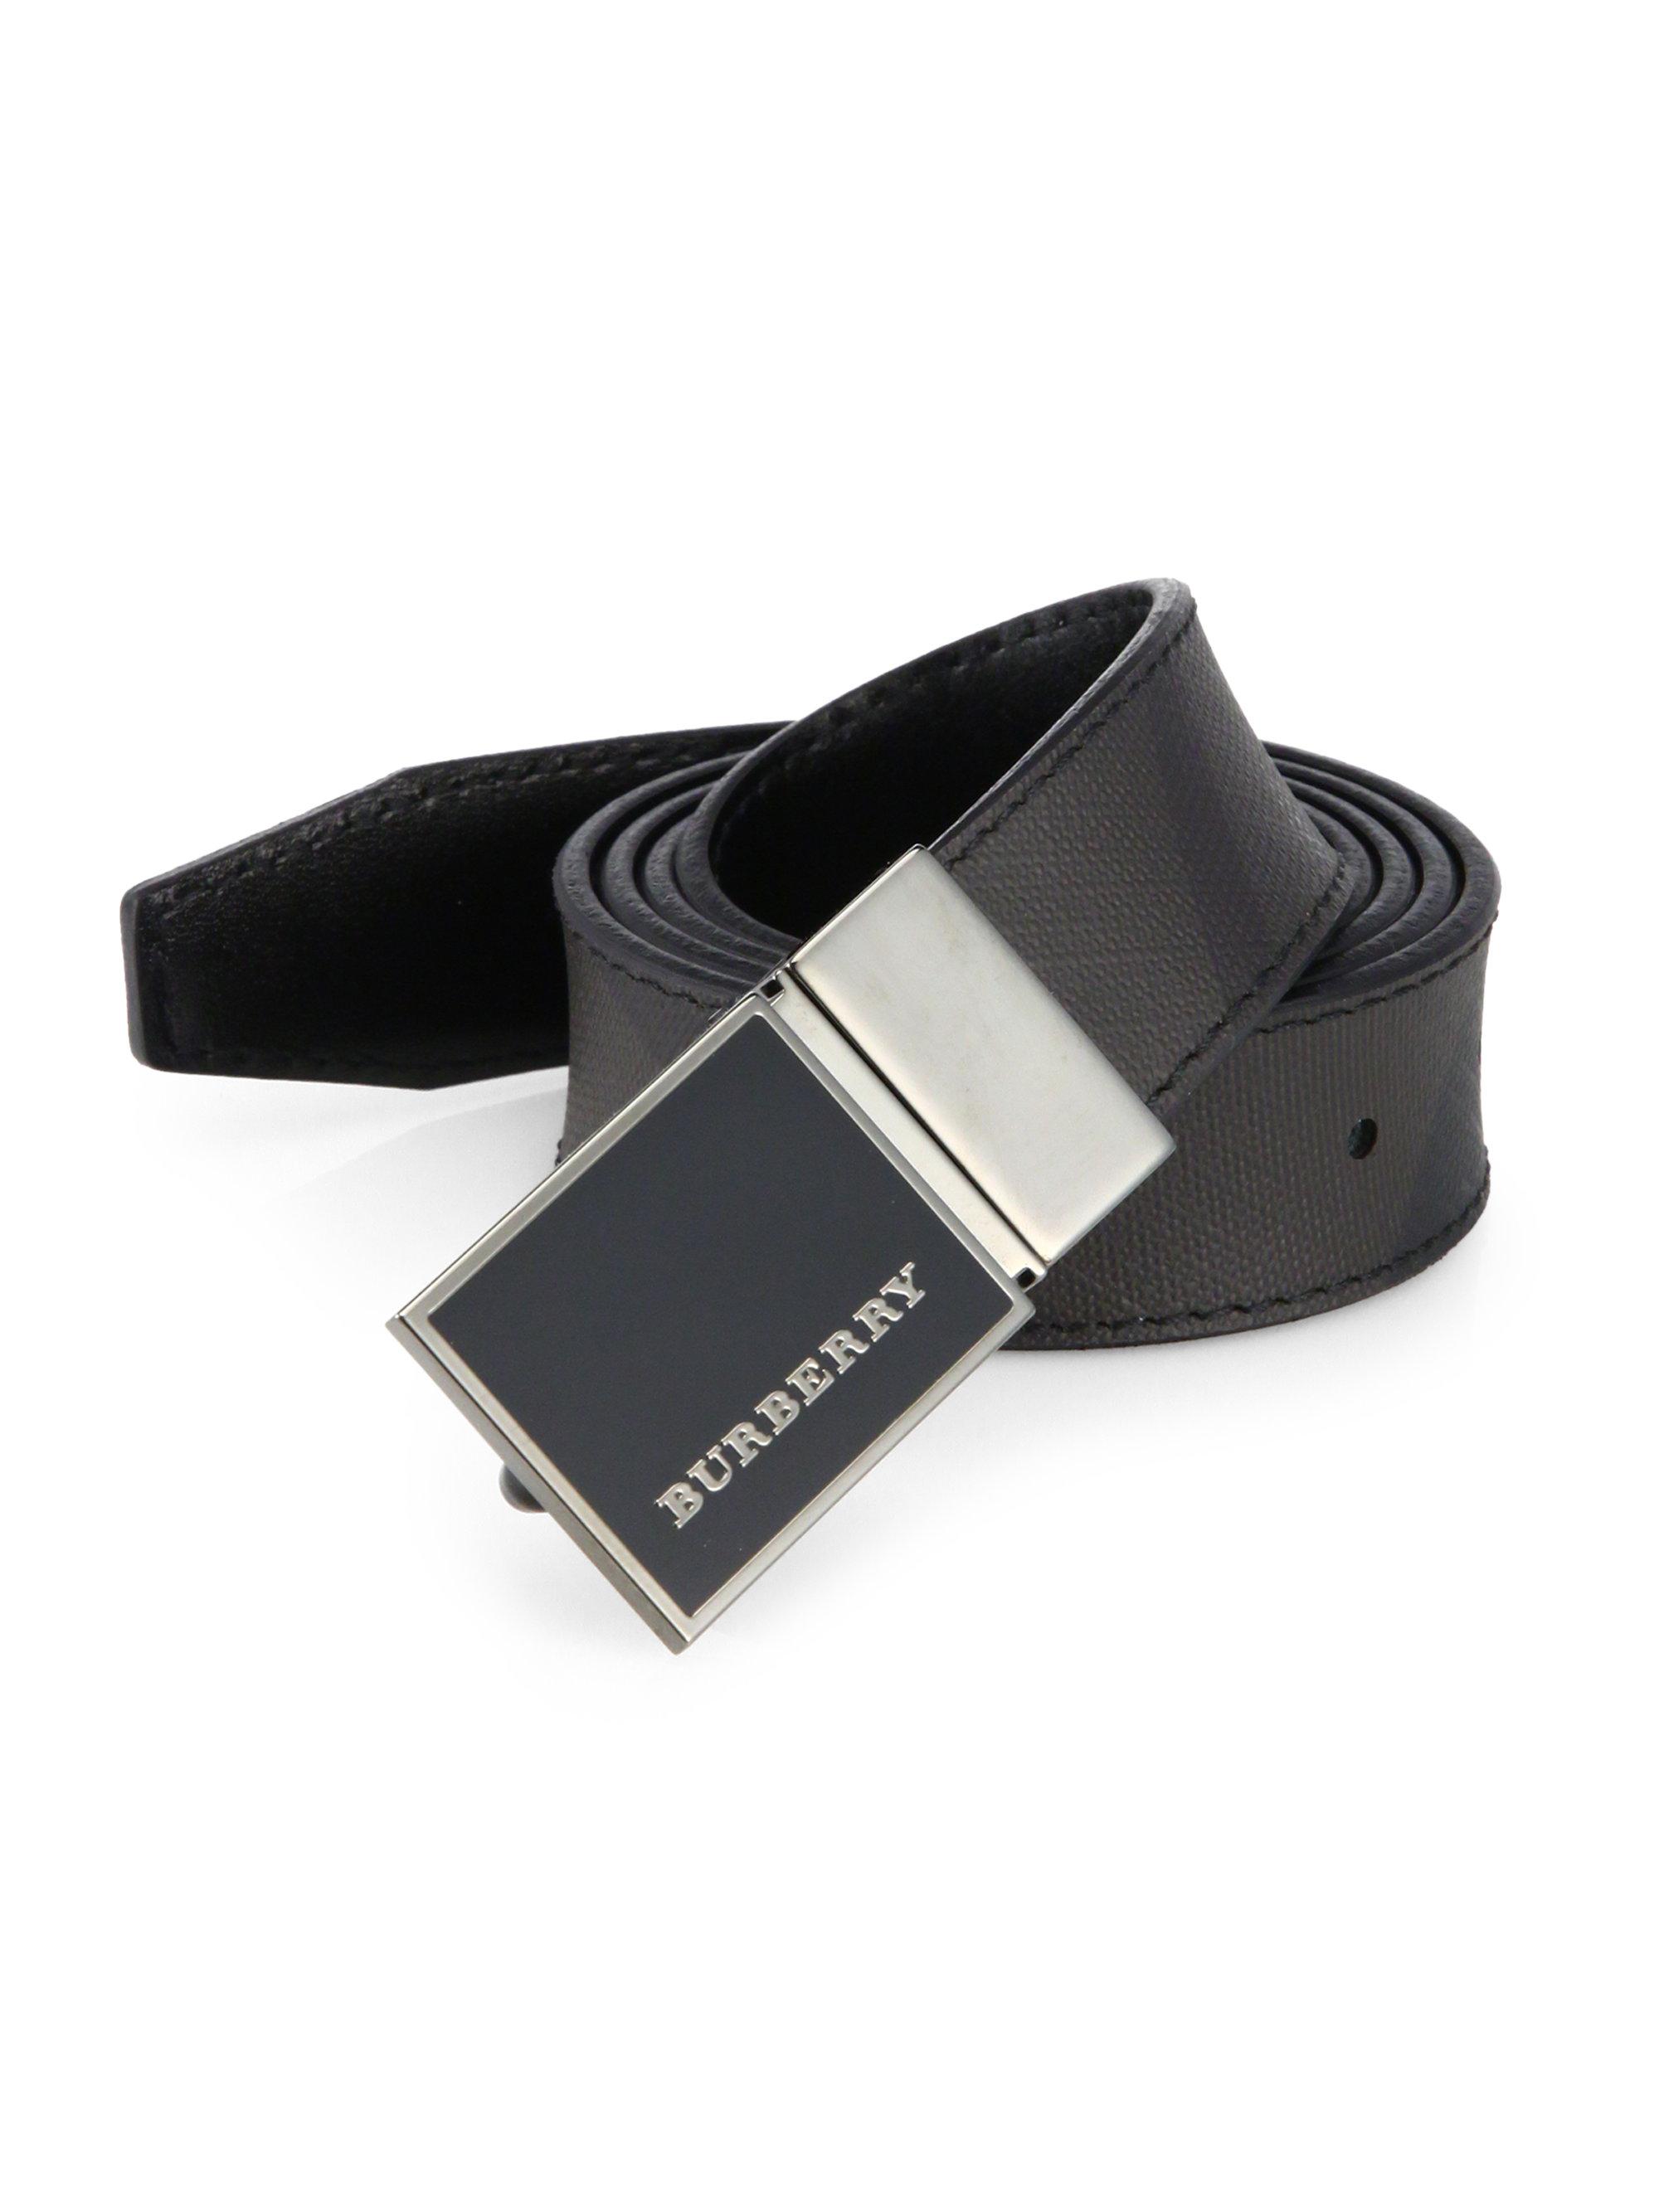 Plaque buckle belt - Black Burberry phZeNKedlU